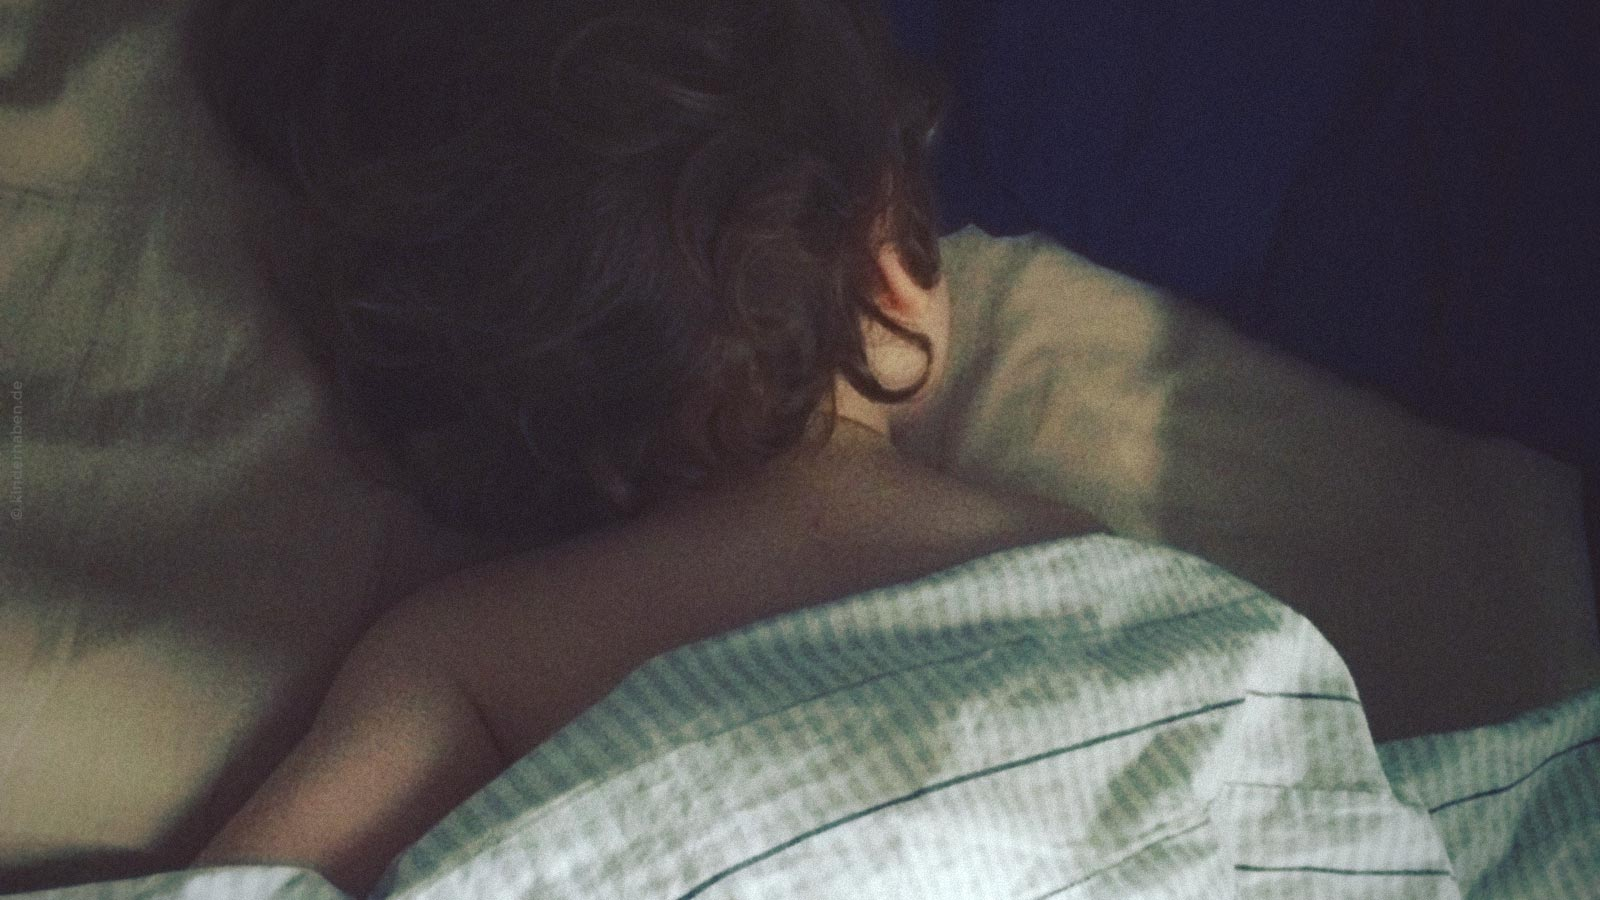 Schlafproblem ©kinderhaben.de